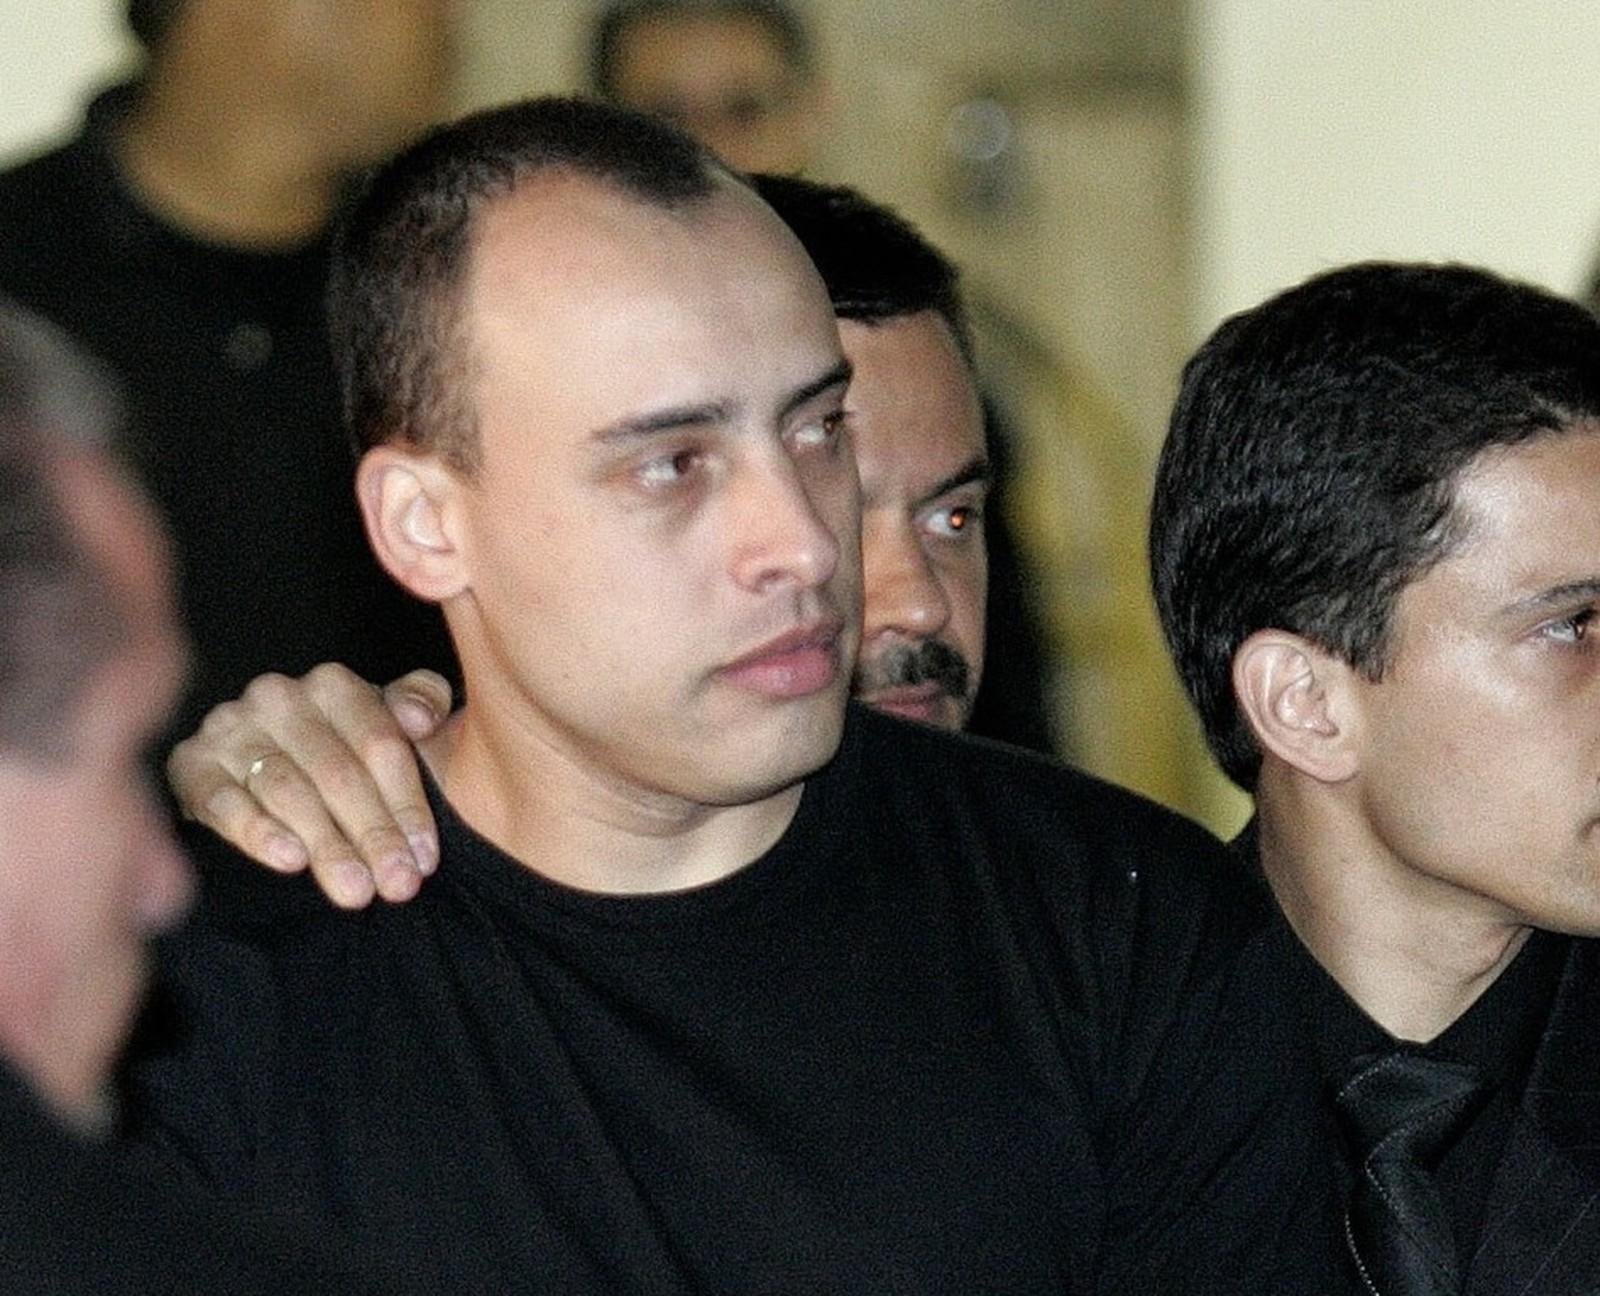 STJ concede habeas corpus para Alexandre Nardoni cumprir pena no semiaberto